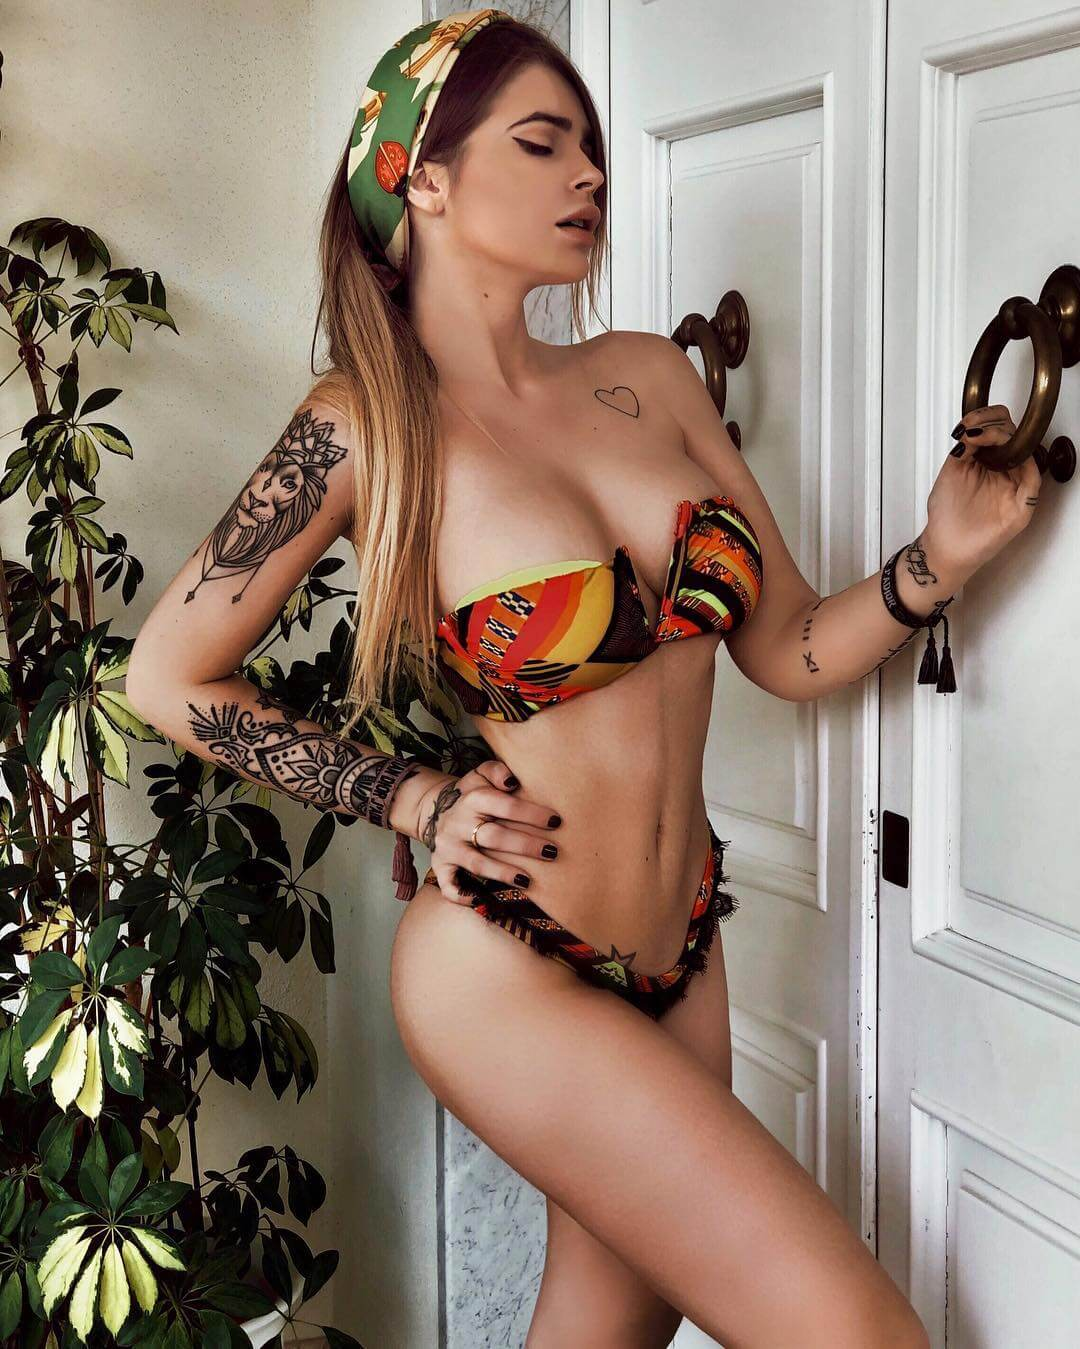 Ginevra Lambruschi hot boobs pics